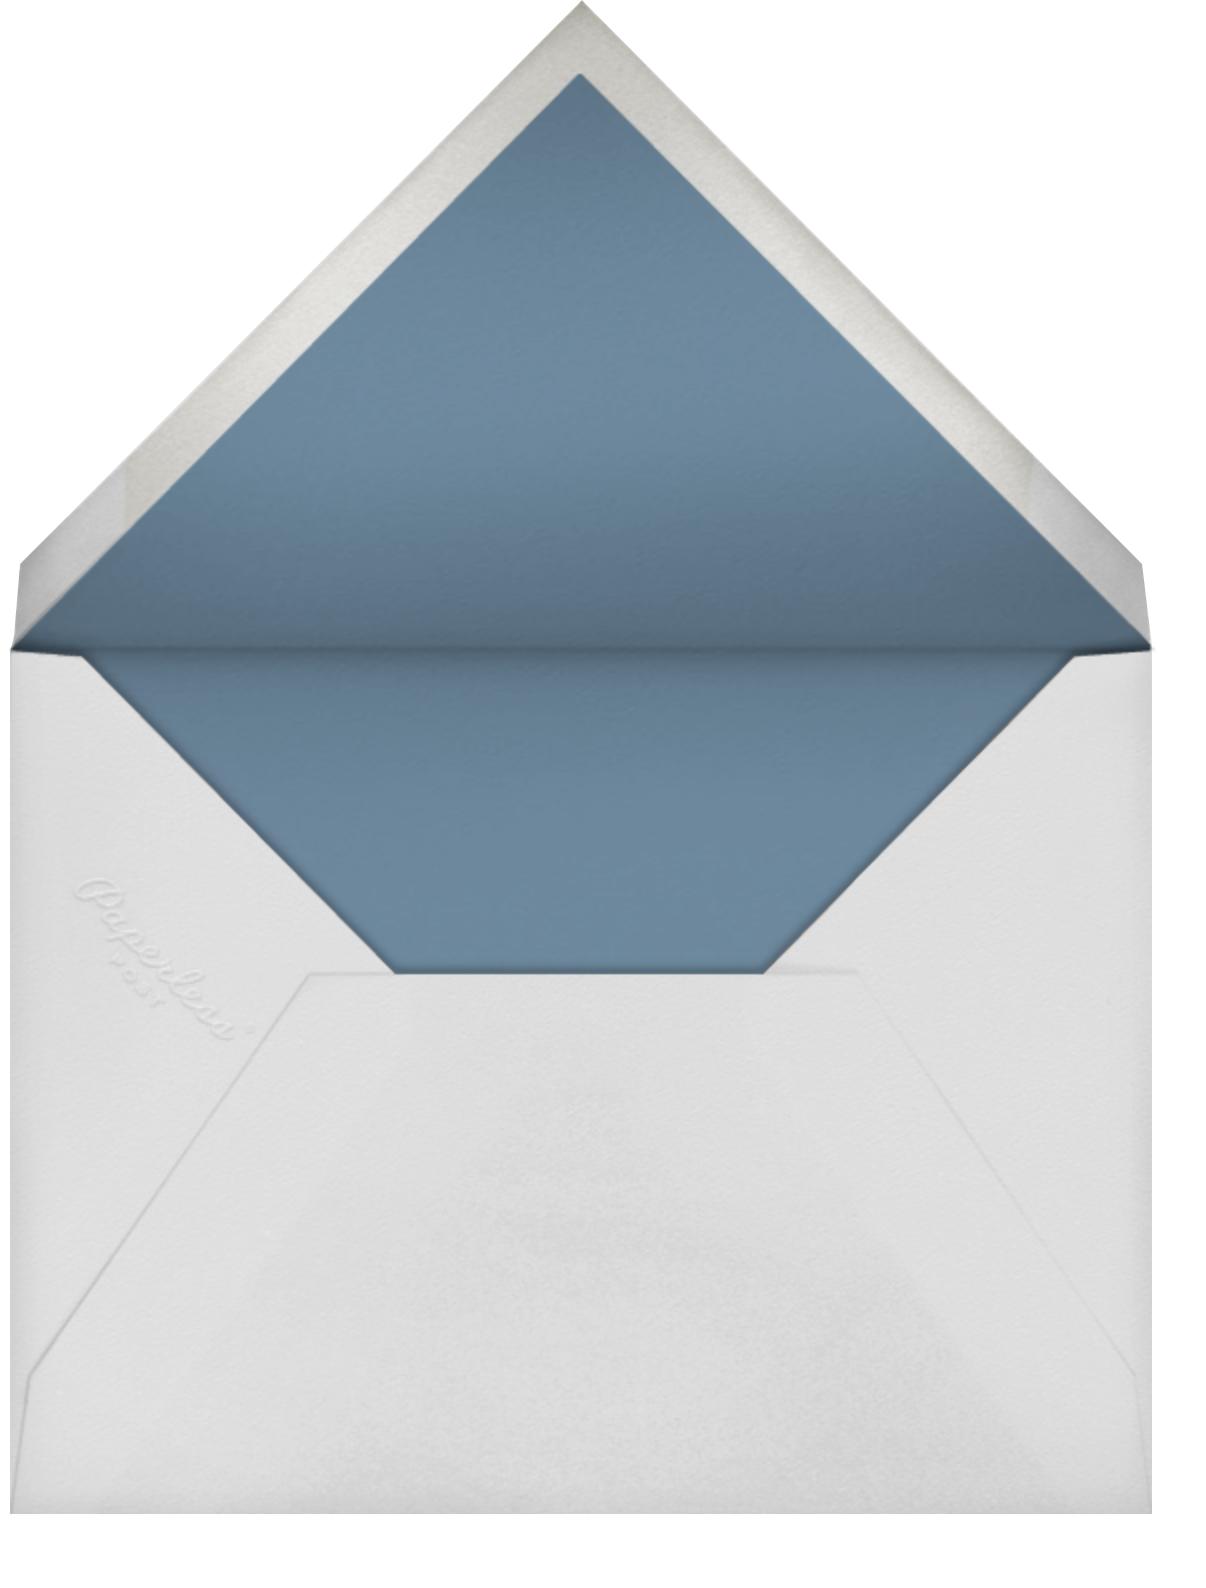 Long Stems - Cadet - kate spade new york - Winter parties - envelope back